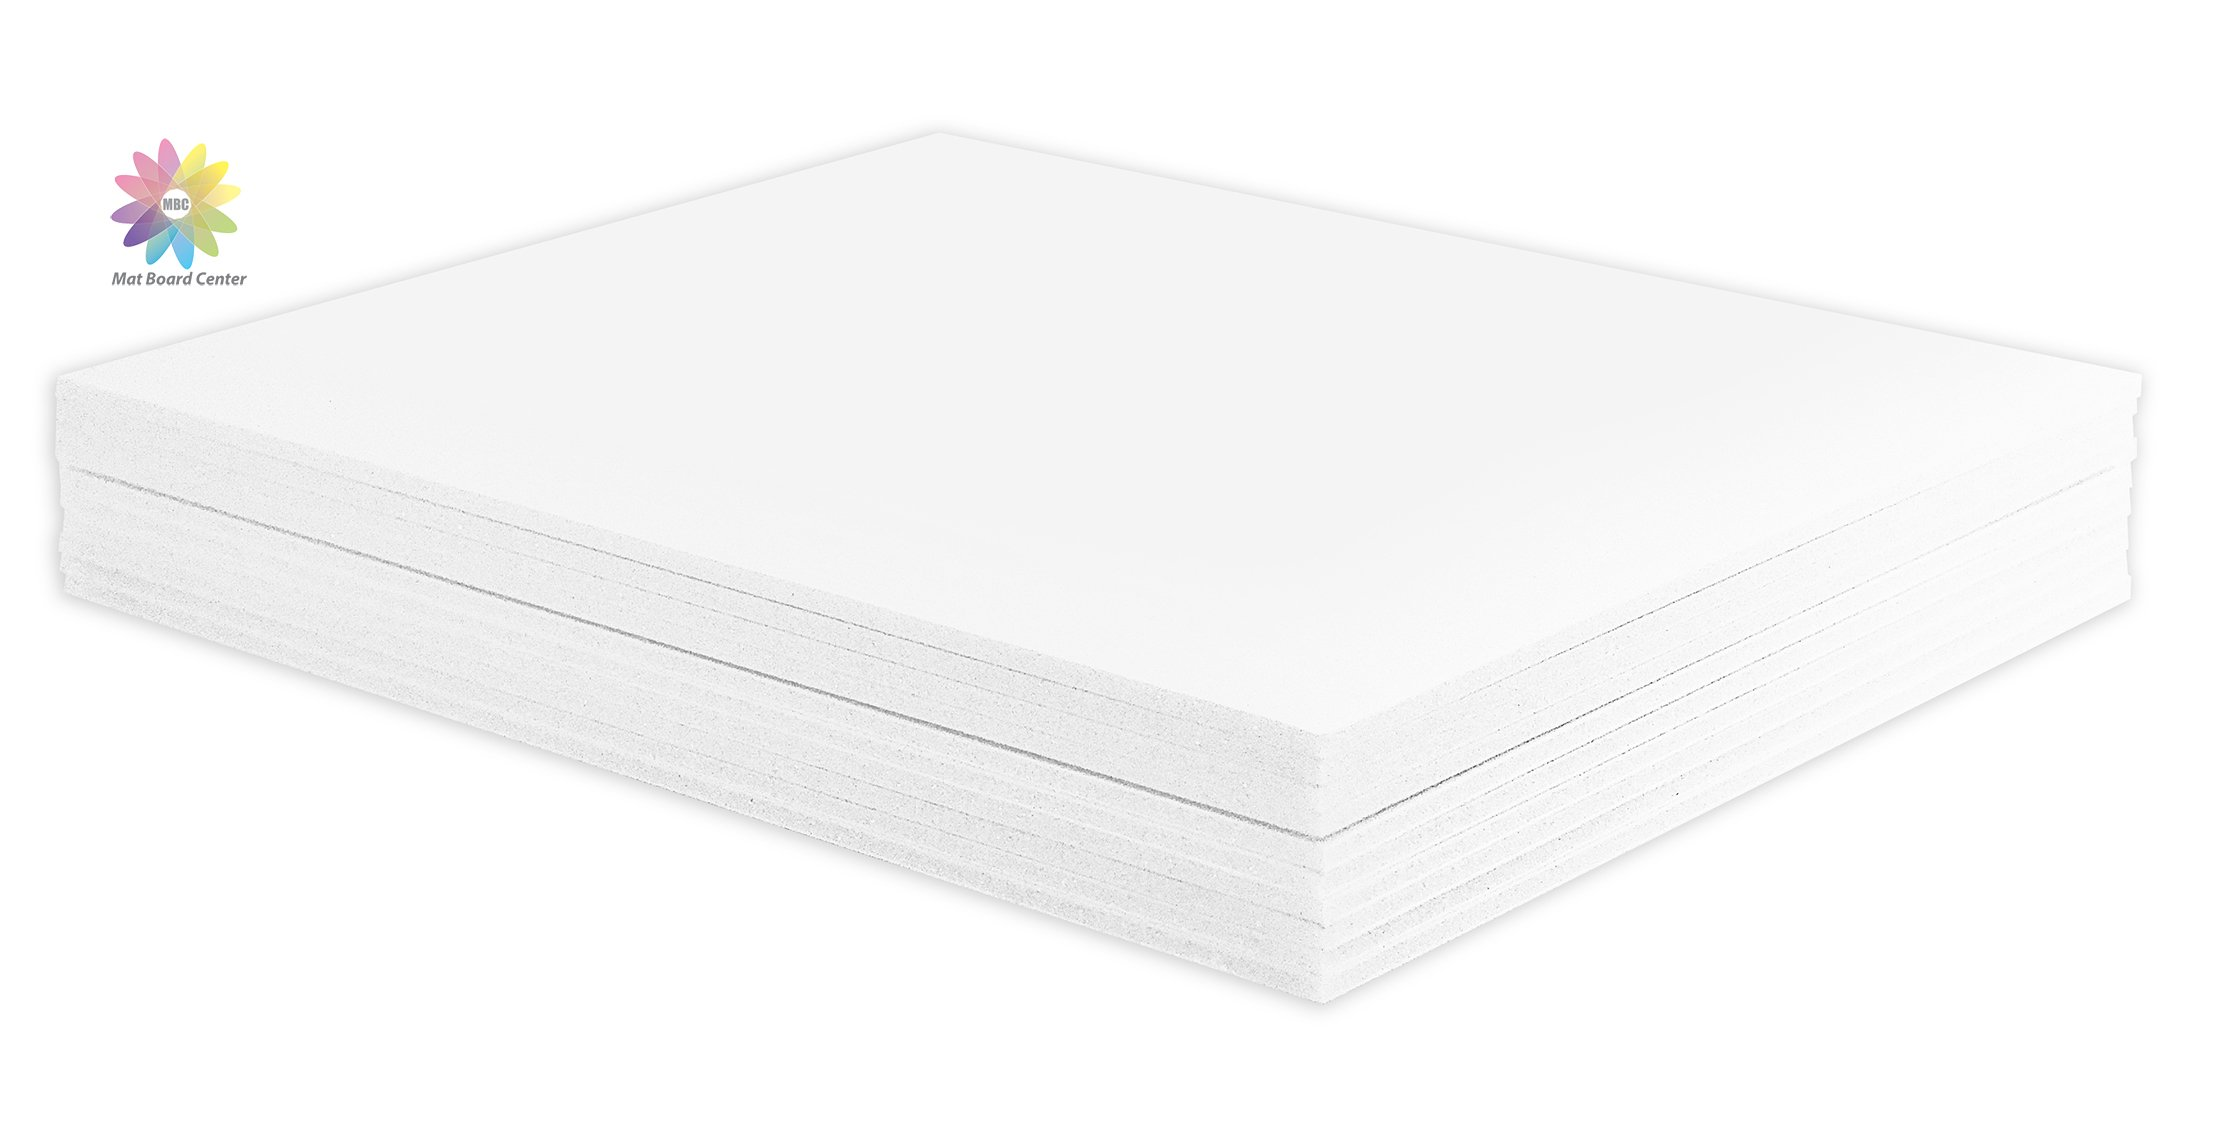 Mat Board Center, Pack of 10 11x14 1/8 White Foam Core Backing Boards by MBC MAT BOARD CENTER